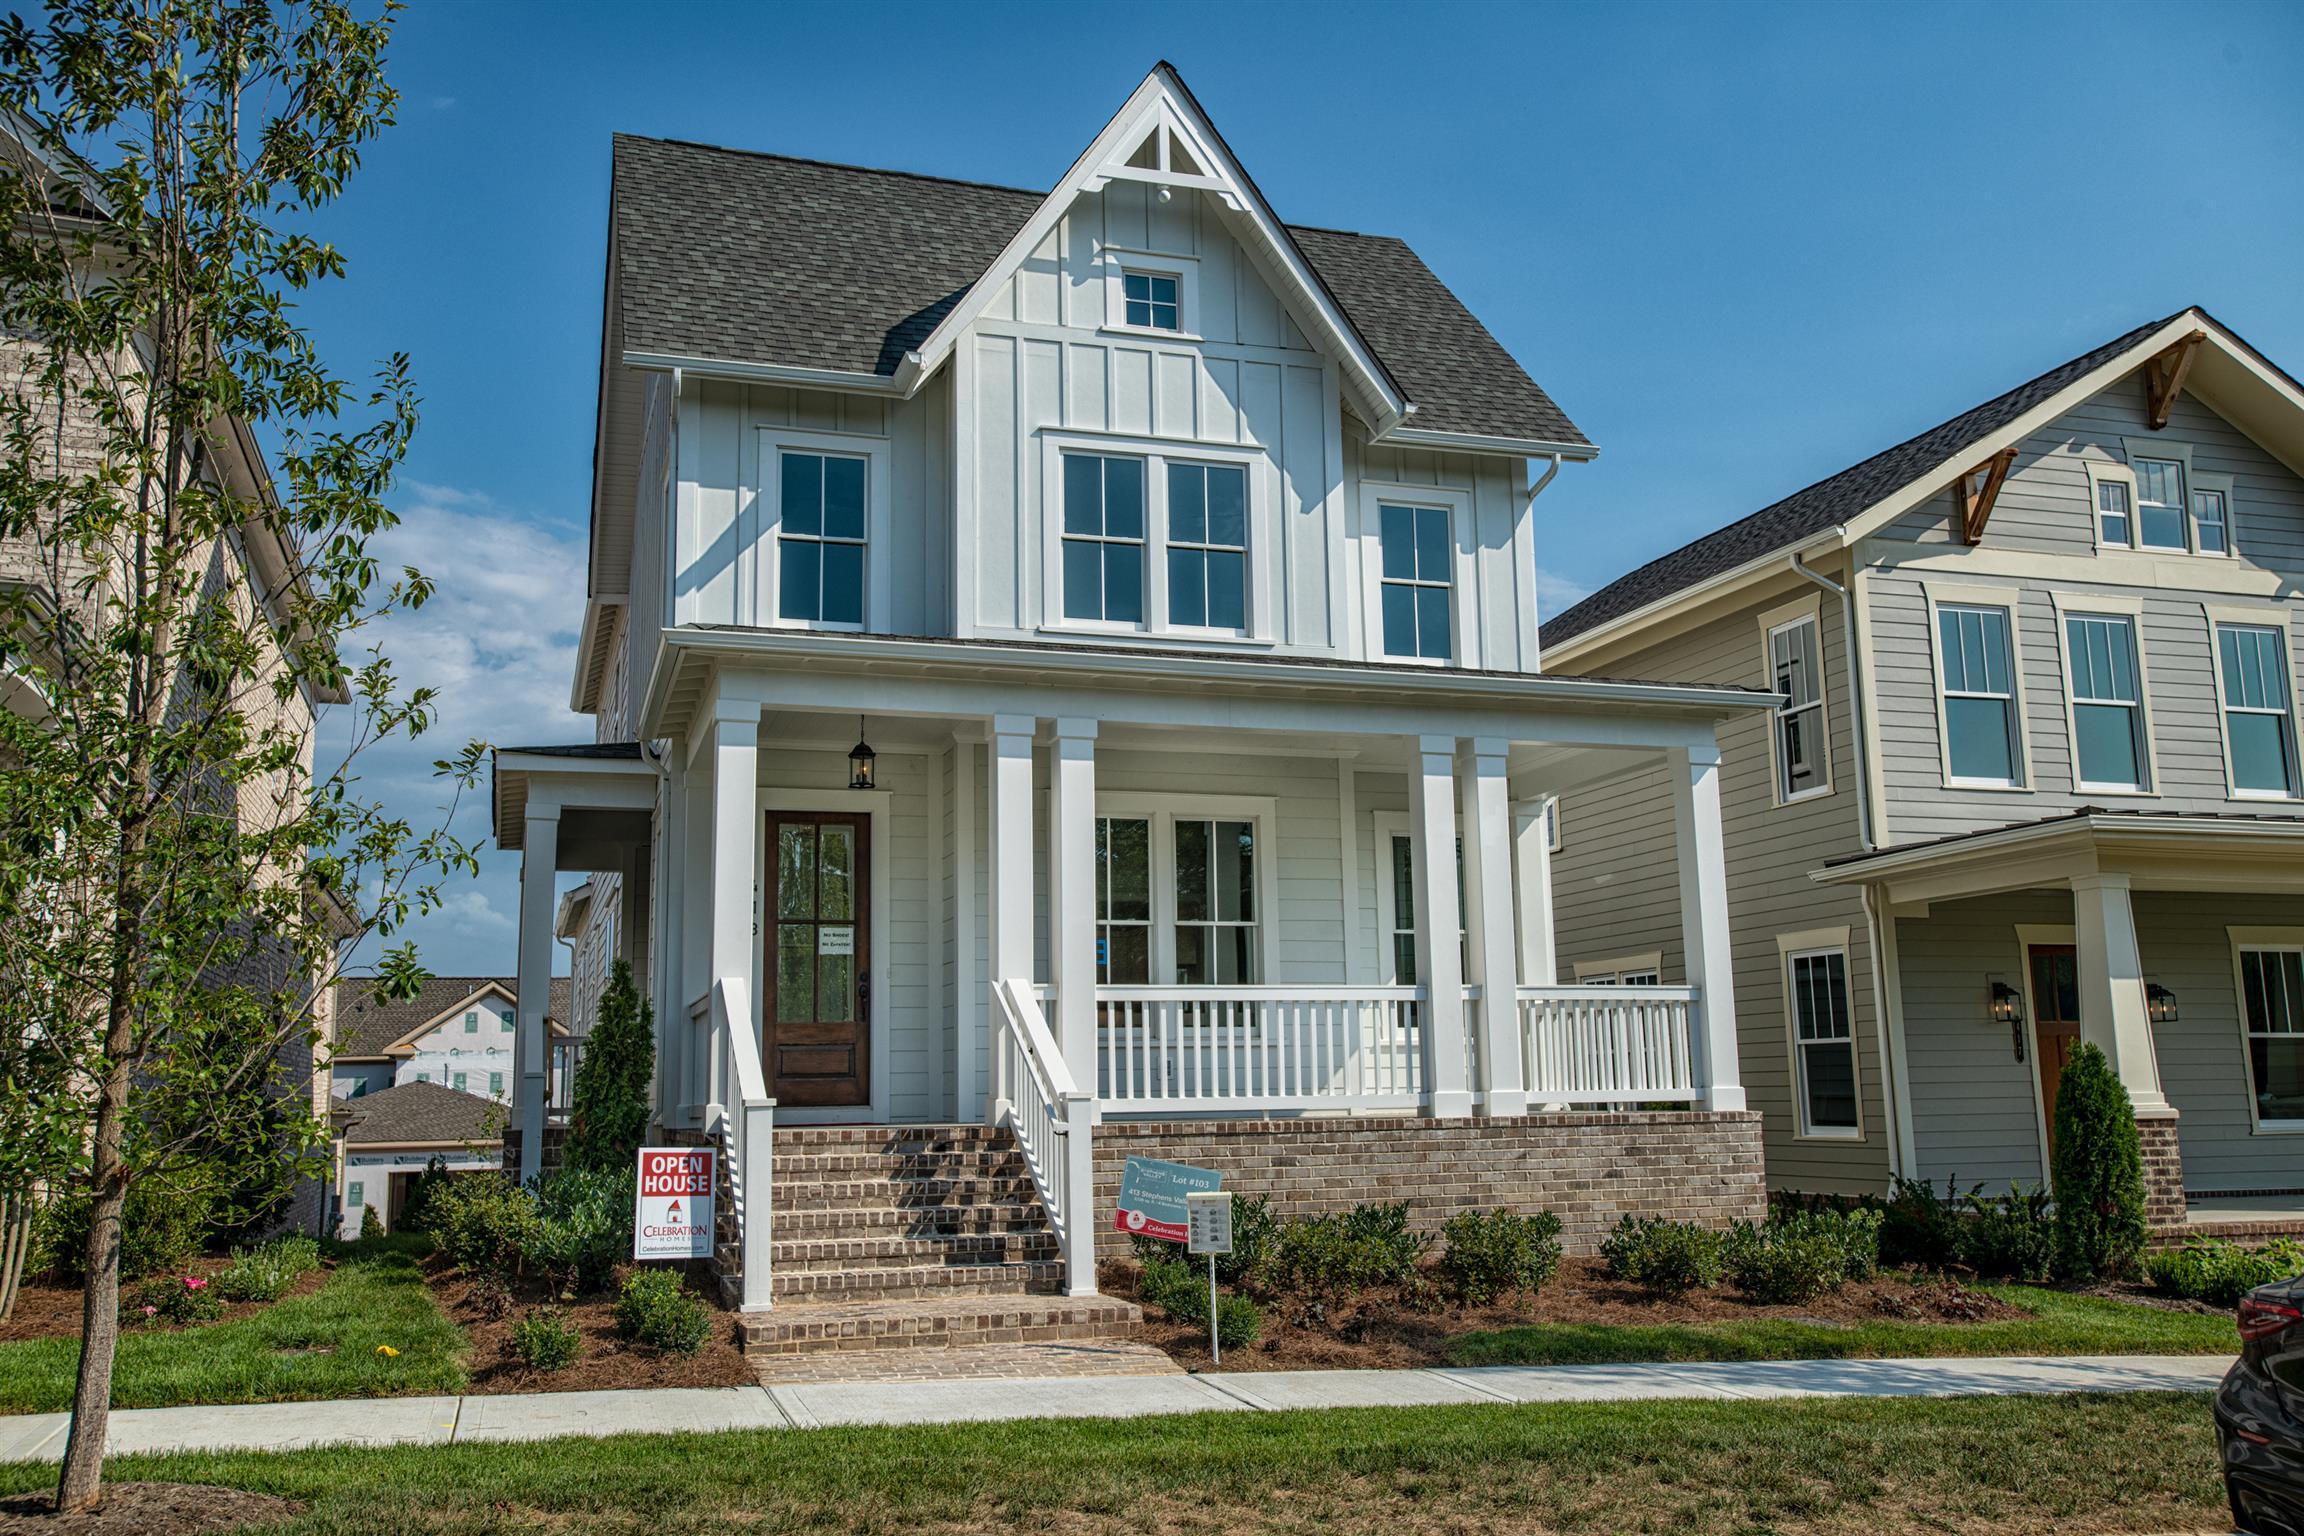 413 Stephens Valley Blvd, Nashville, TN 37221 - Nashville, TN real estate listing